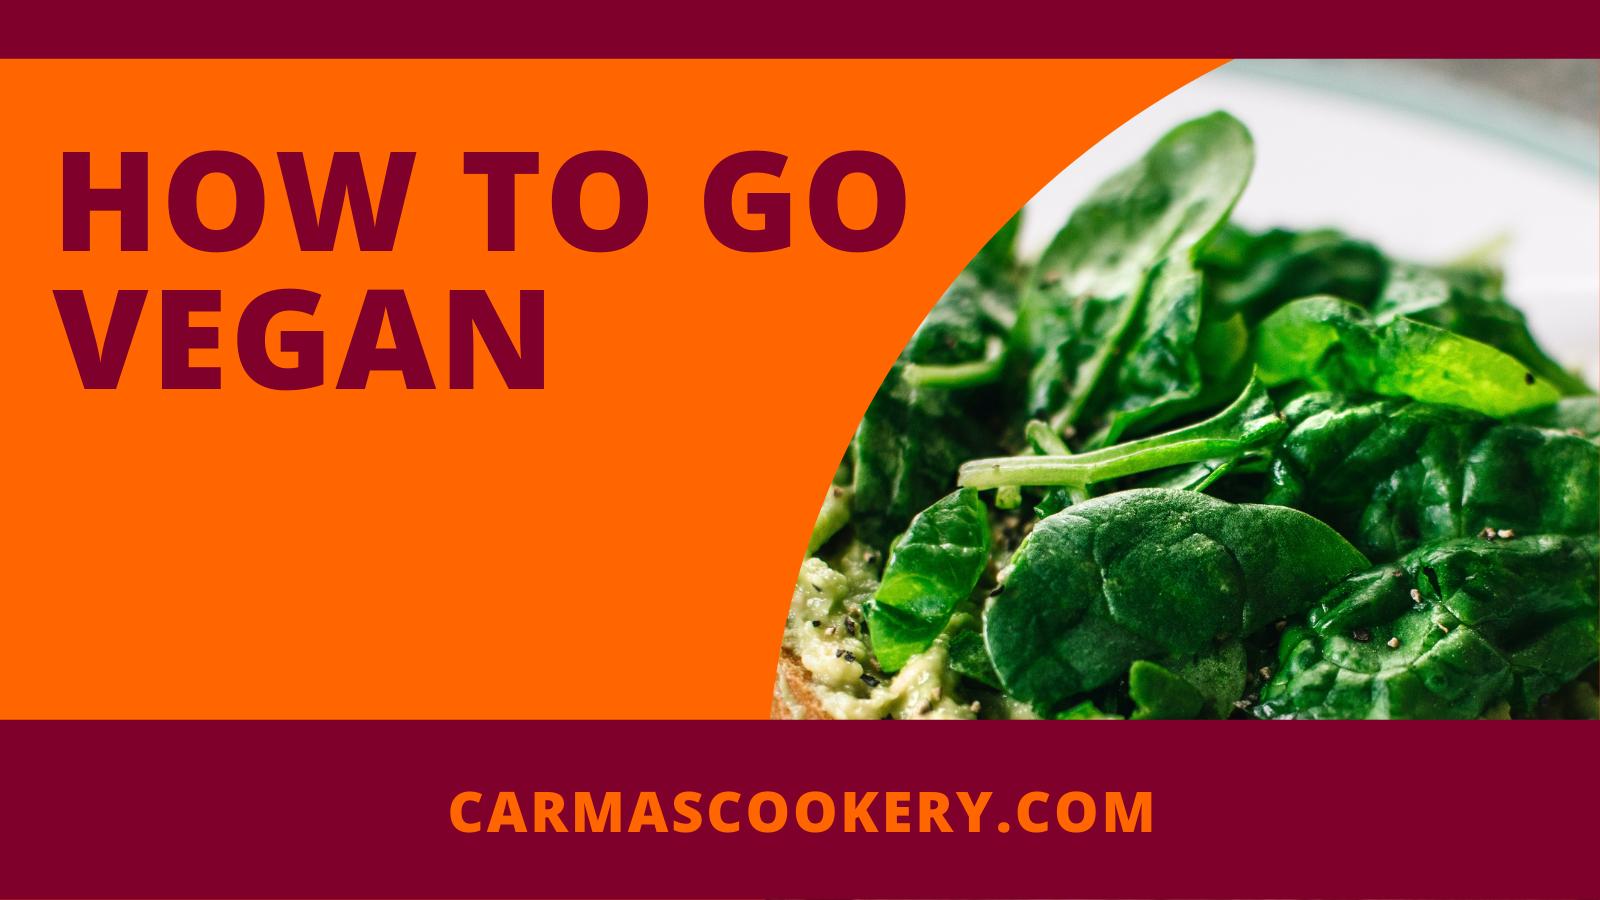 How to Go Vegan